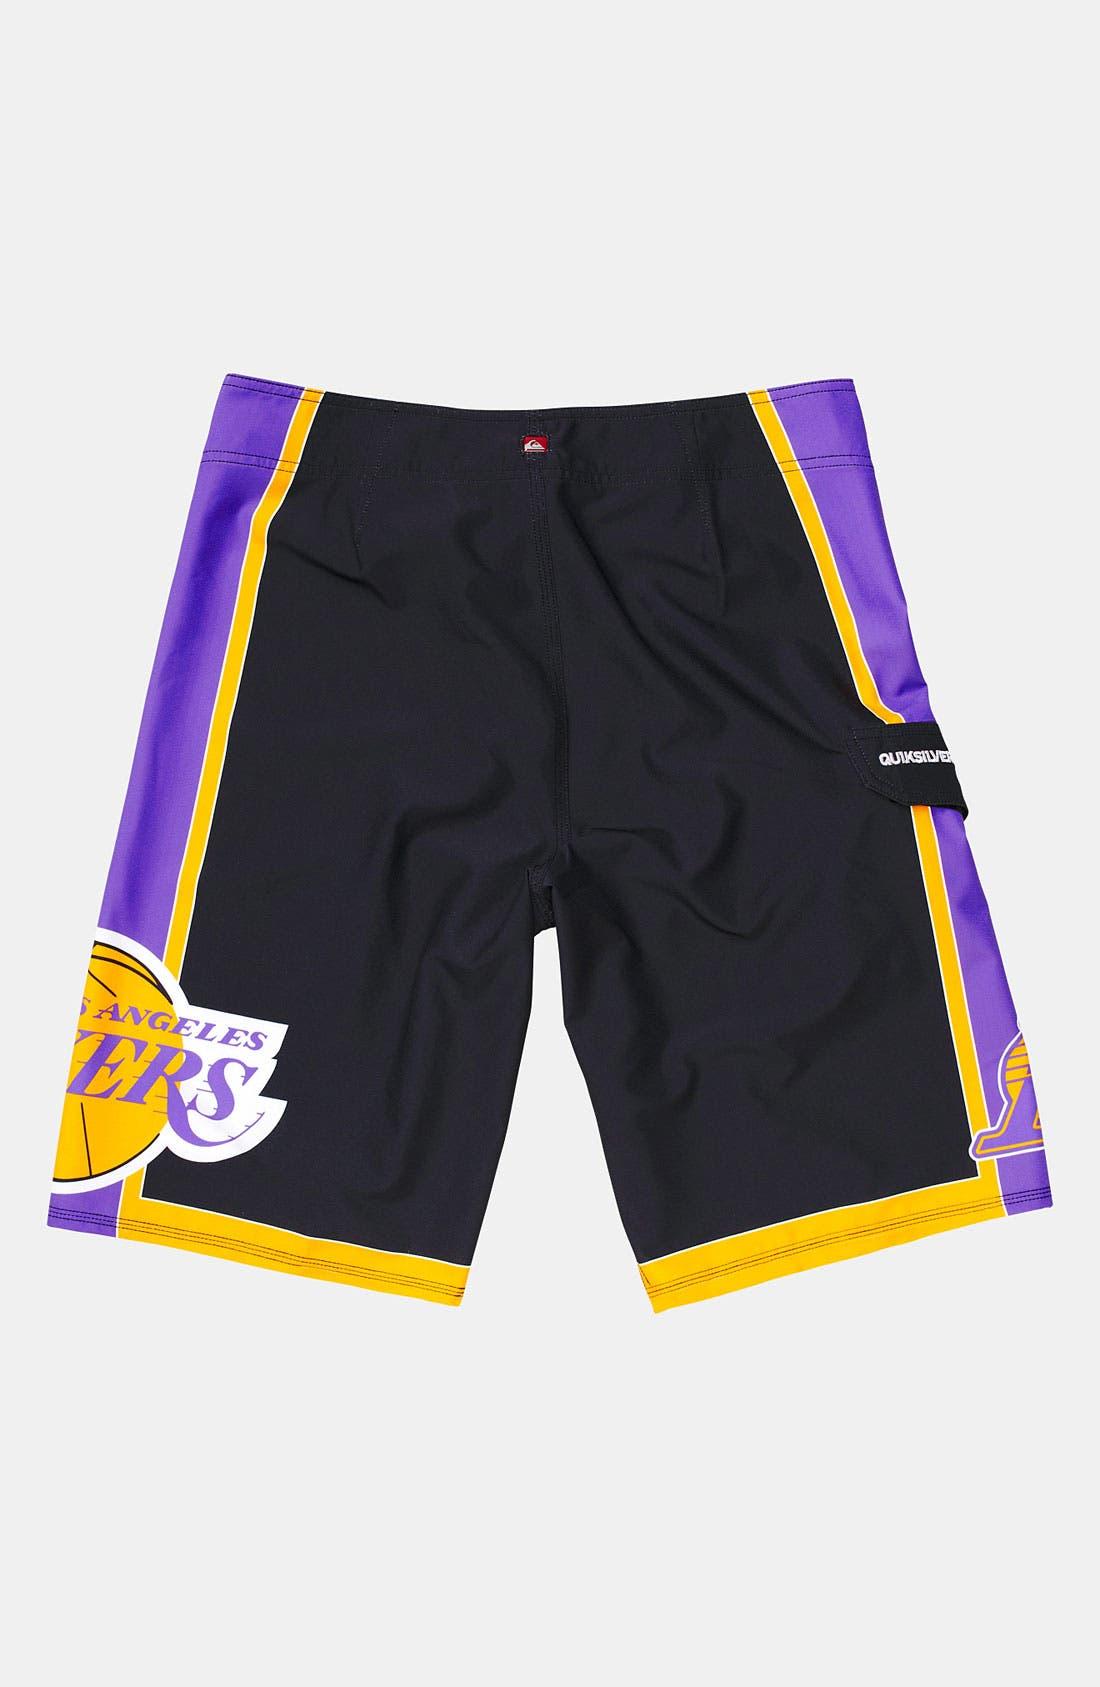 Alternate Image 2  - Quiksilver 'Lakers' Board Shorts (Big Boys)